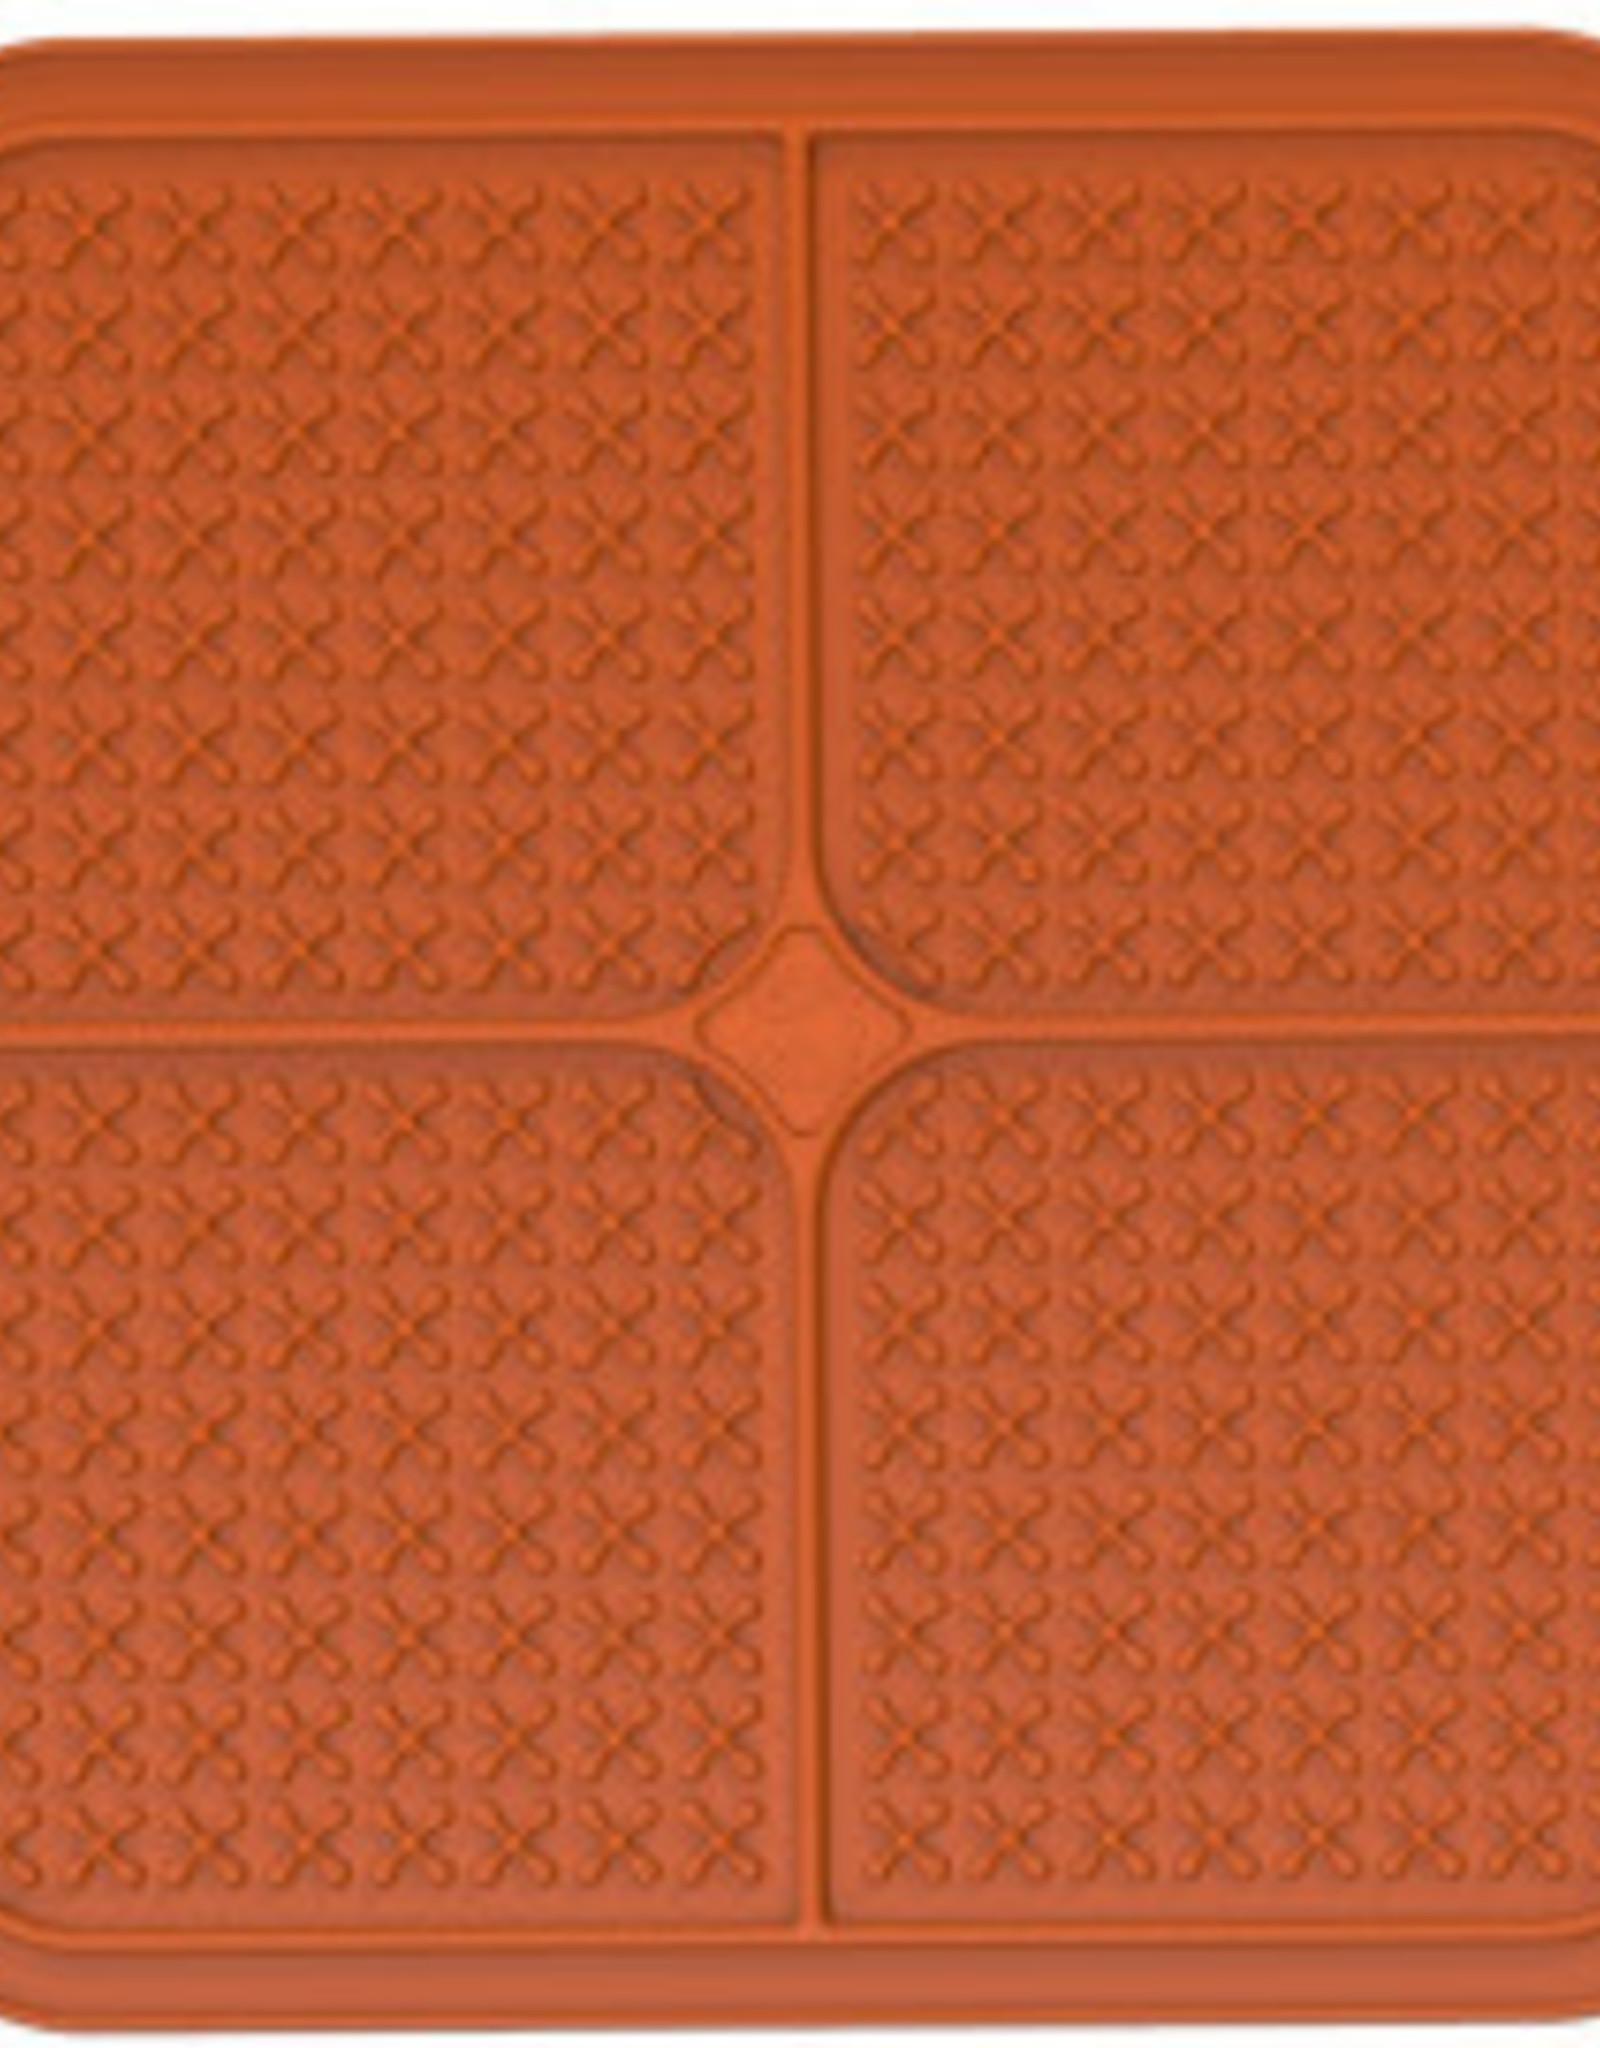 LickiMat Lickimat Buddy Crosses Orange Large